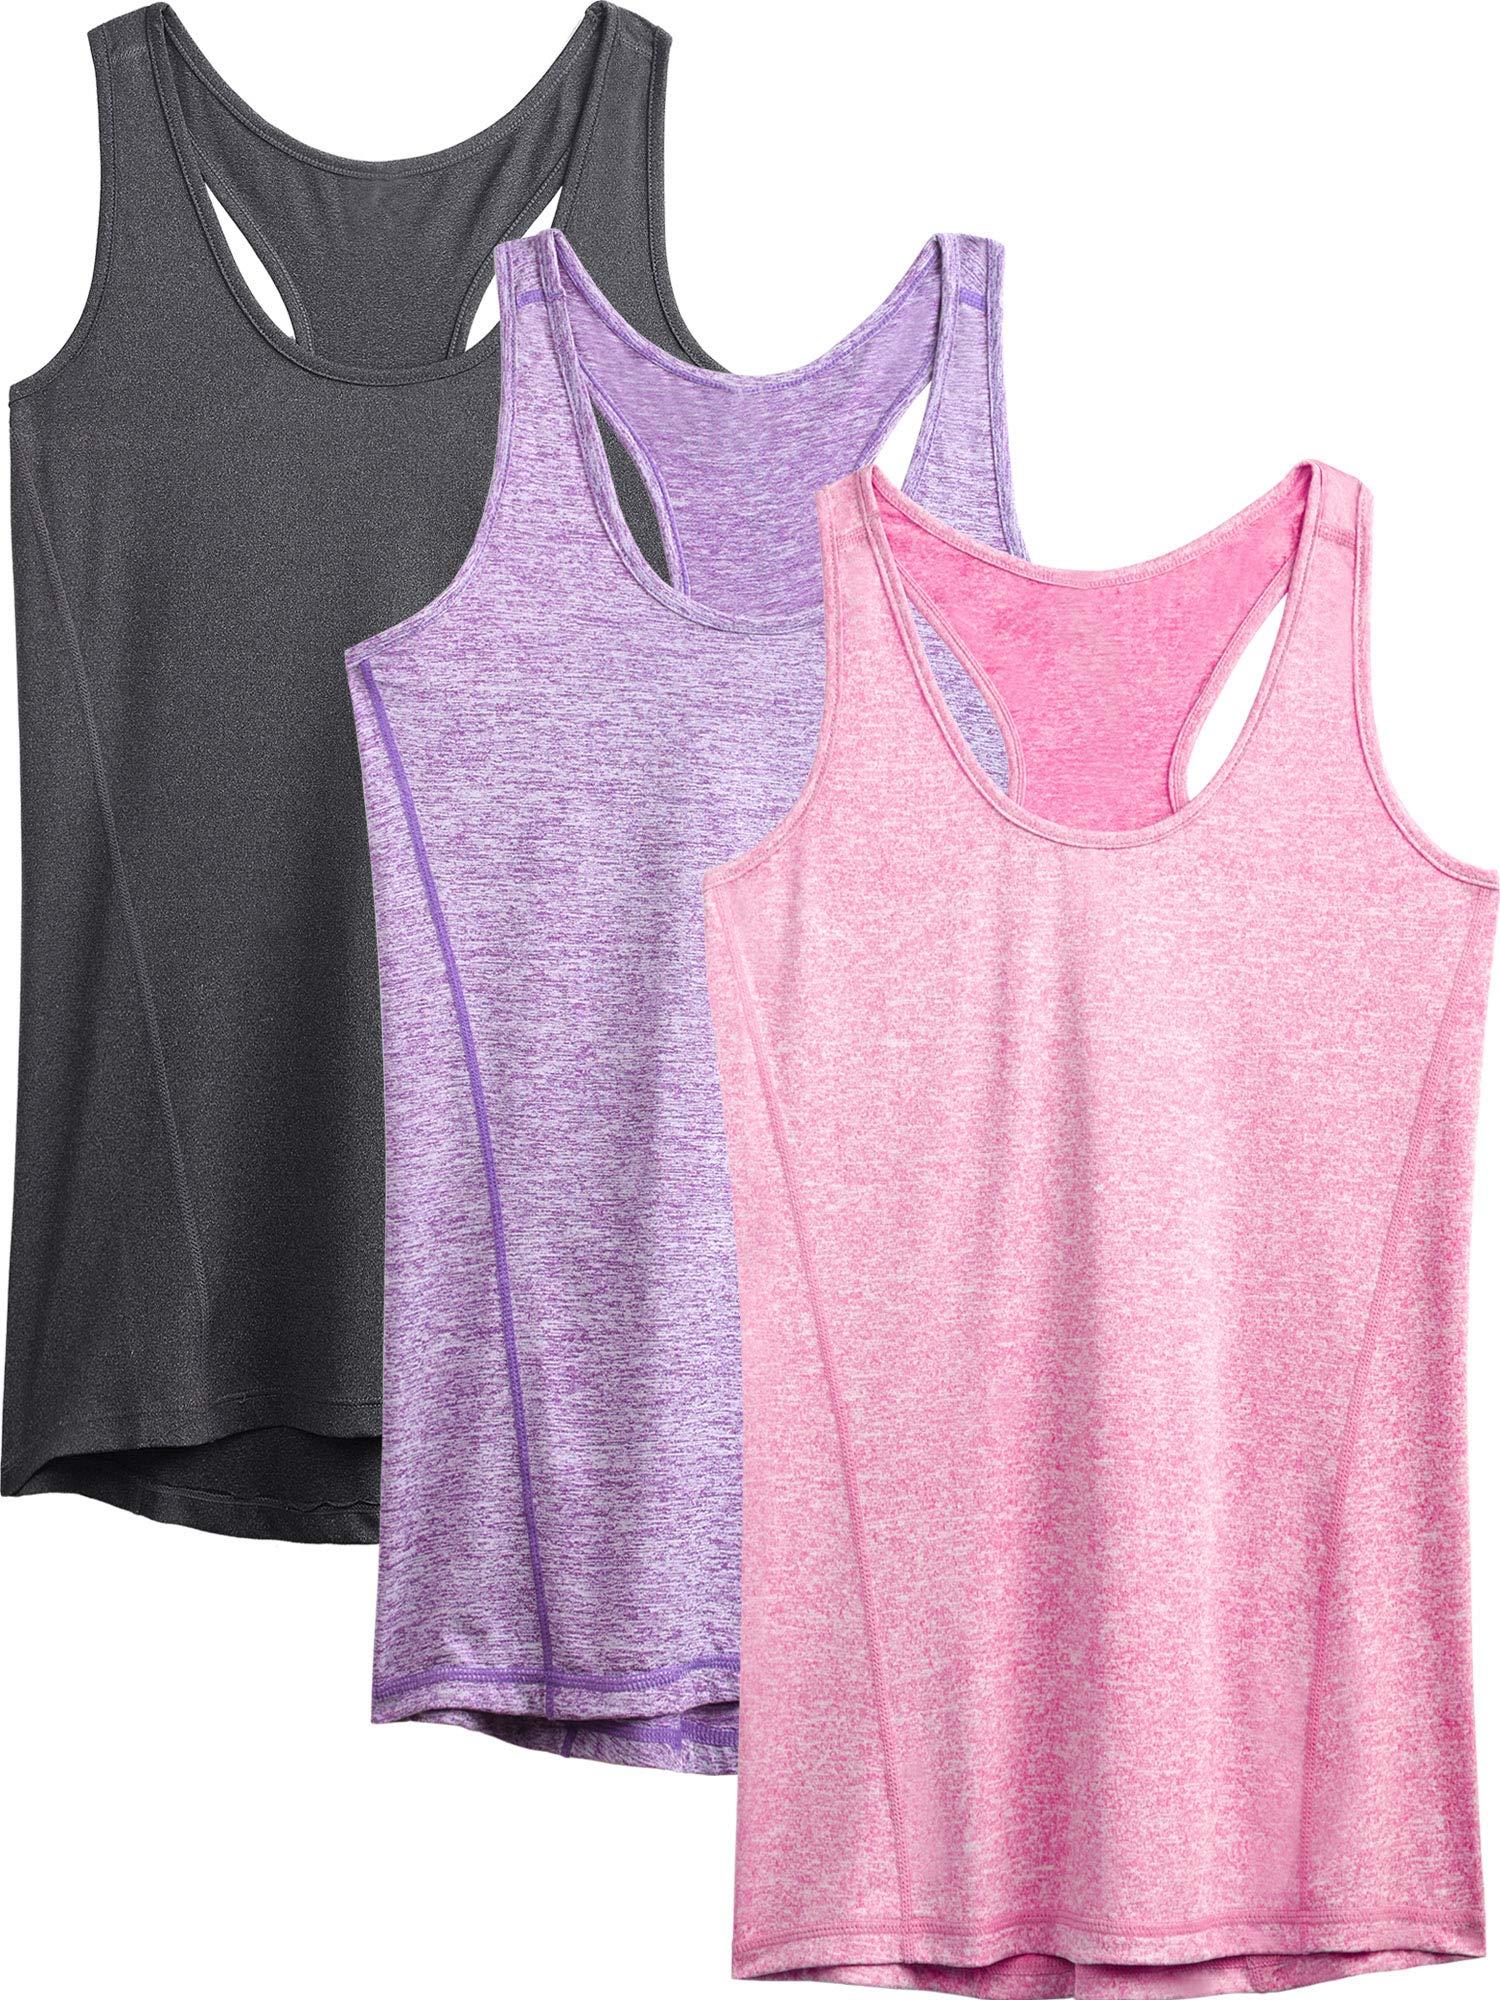 Neleus Workout Running Racerback Long Tank Top for Women,8006,3 Pack,Grey,Purple,Rose red,XL,EU 2XL by Neleus